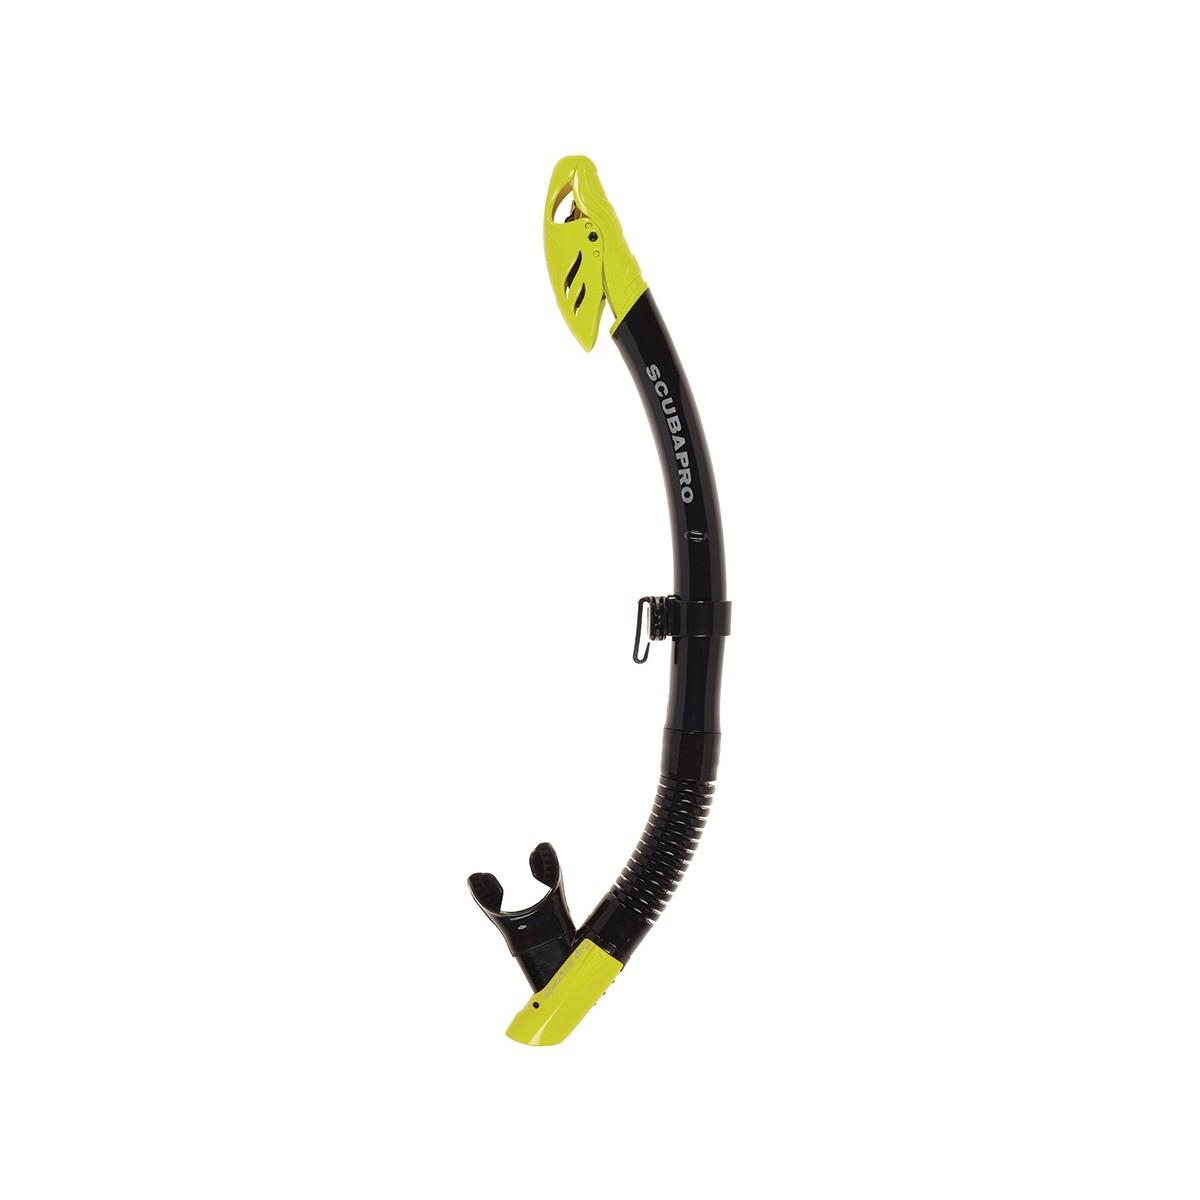 Scubapro Spectra Dry Snorkel